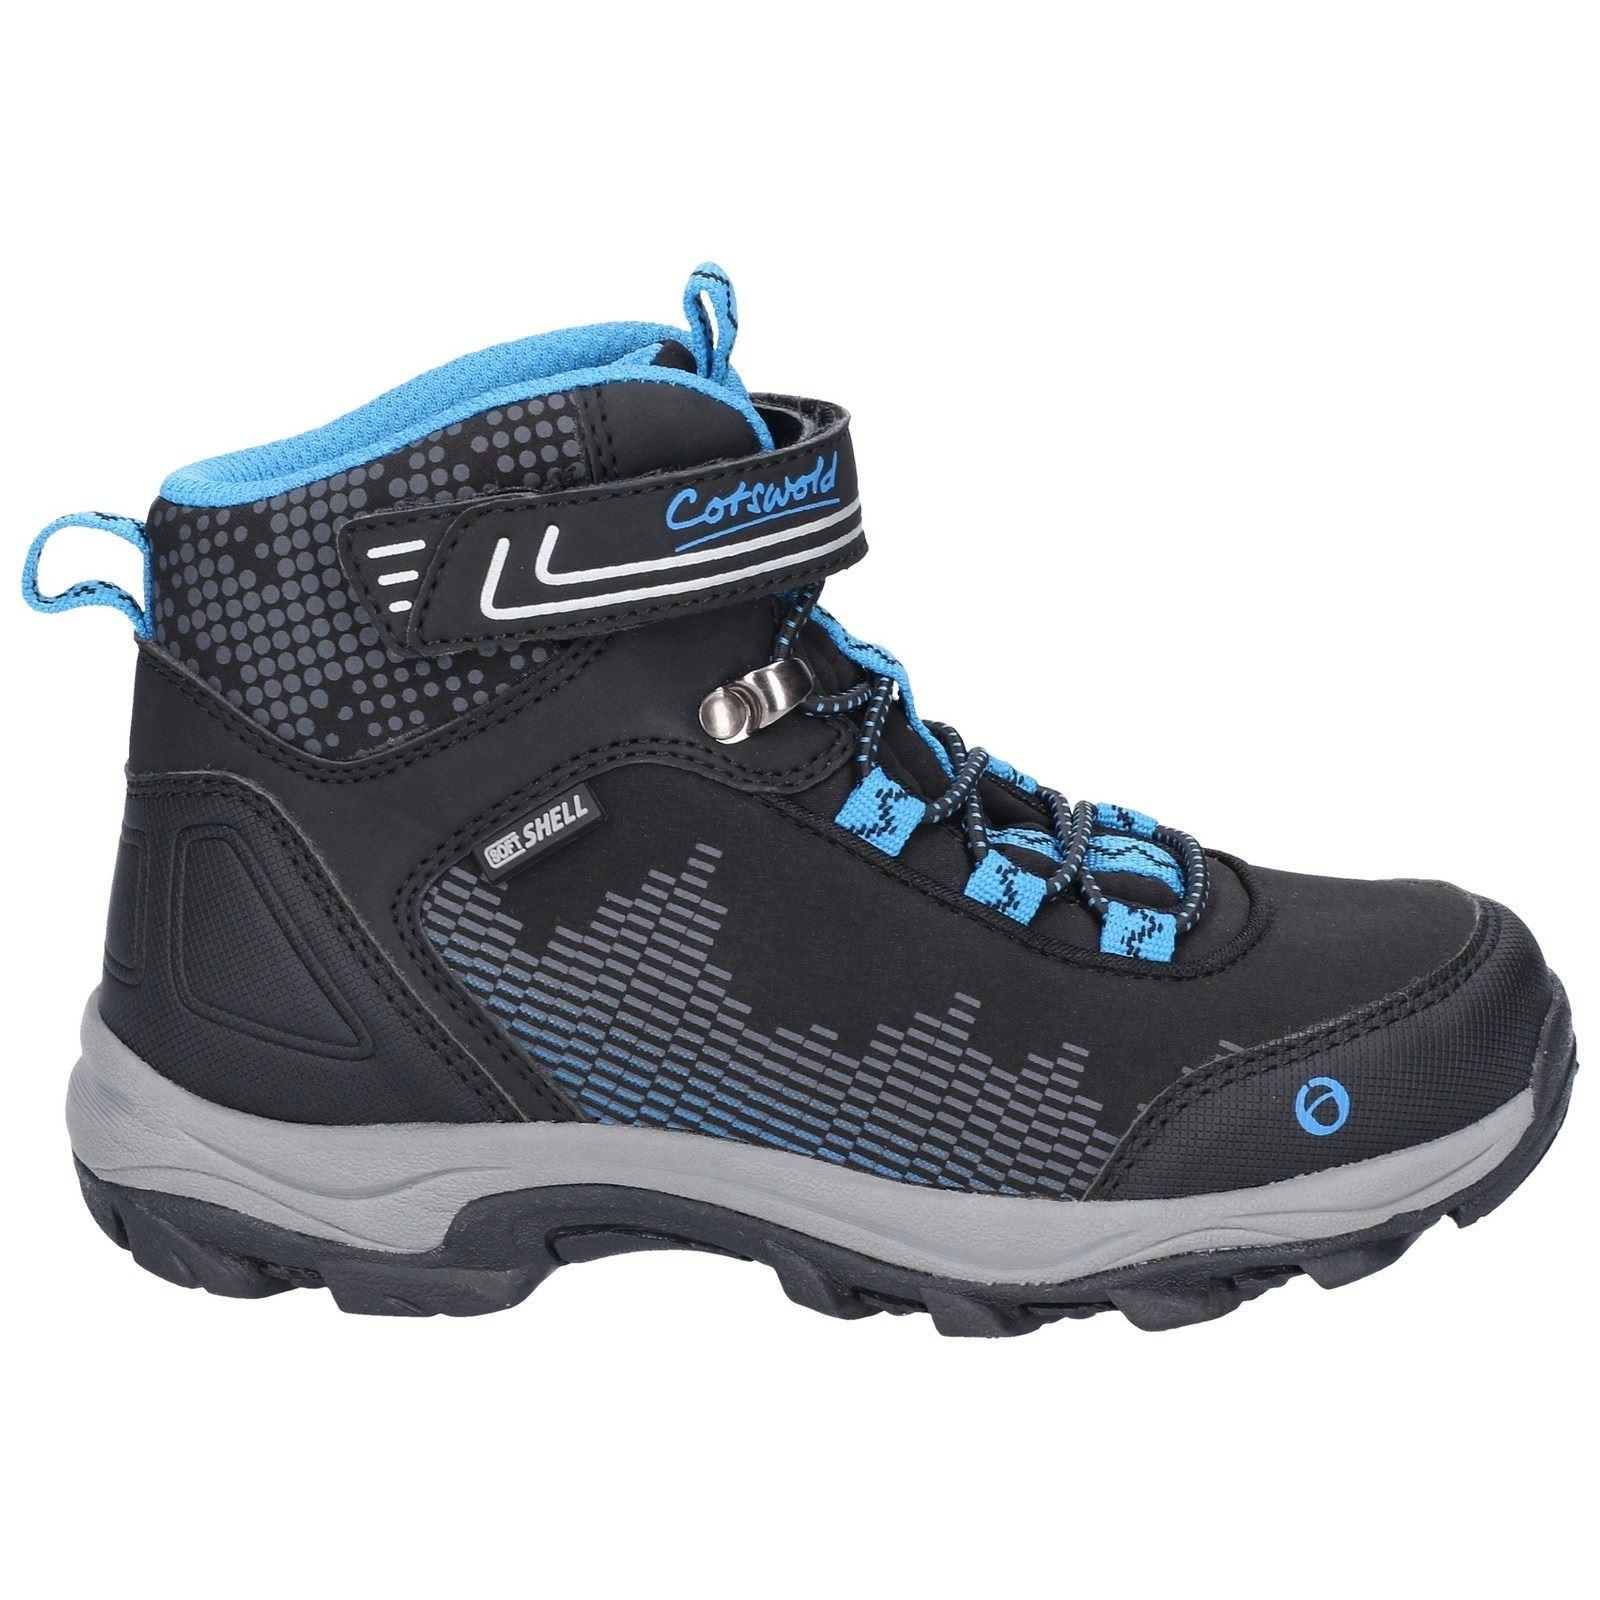 9e4bc72b608 Details about Cotswold Ducklington Black/Blue Childrens Hiking Boots  Textile+Synthetic